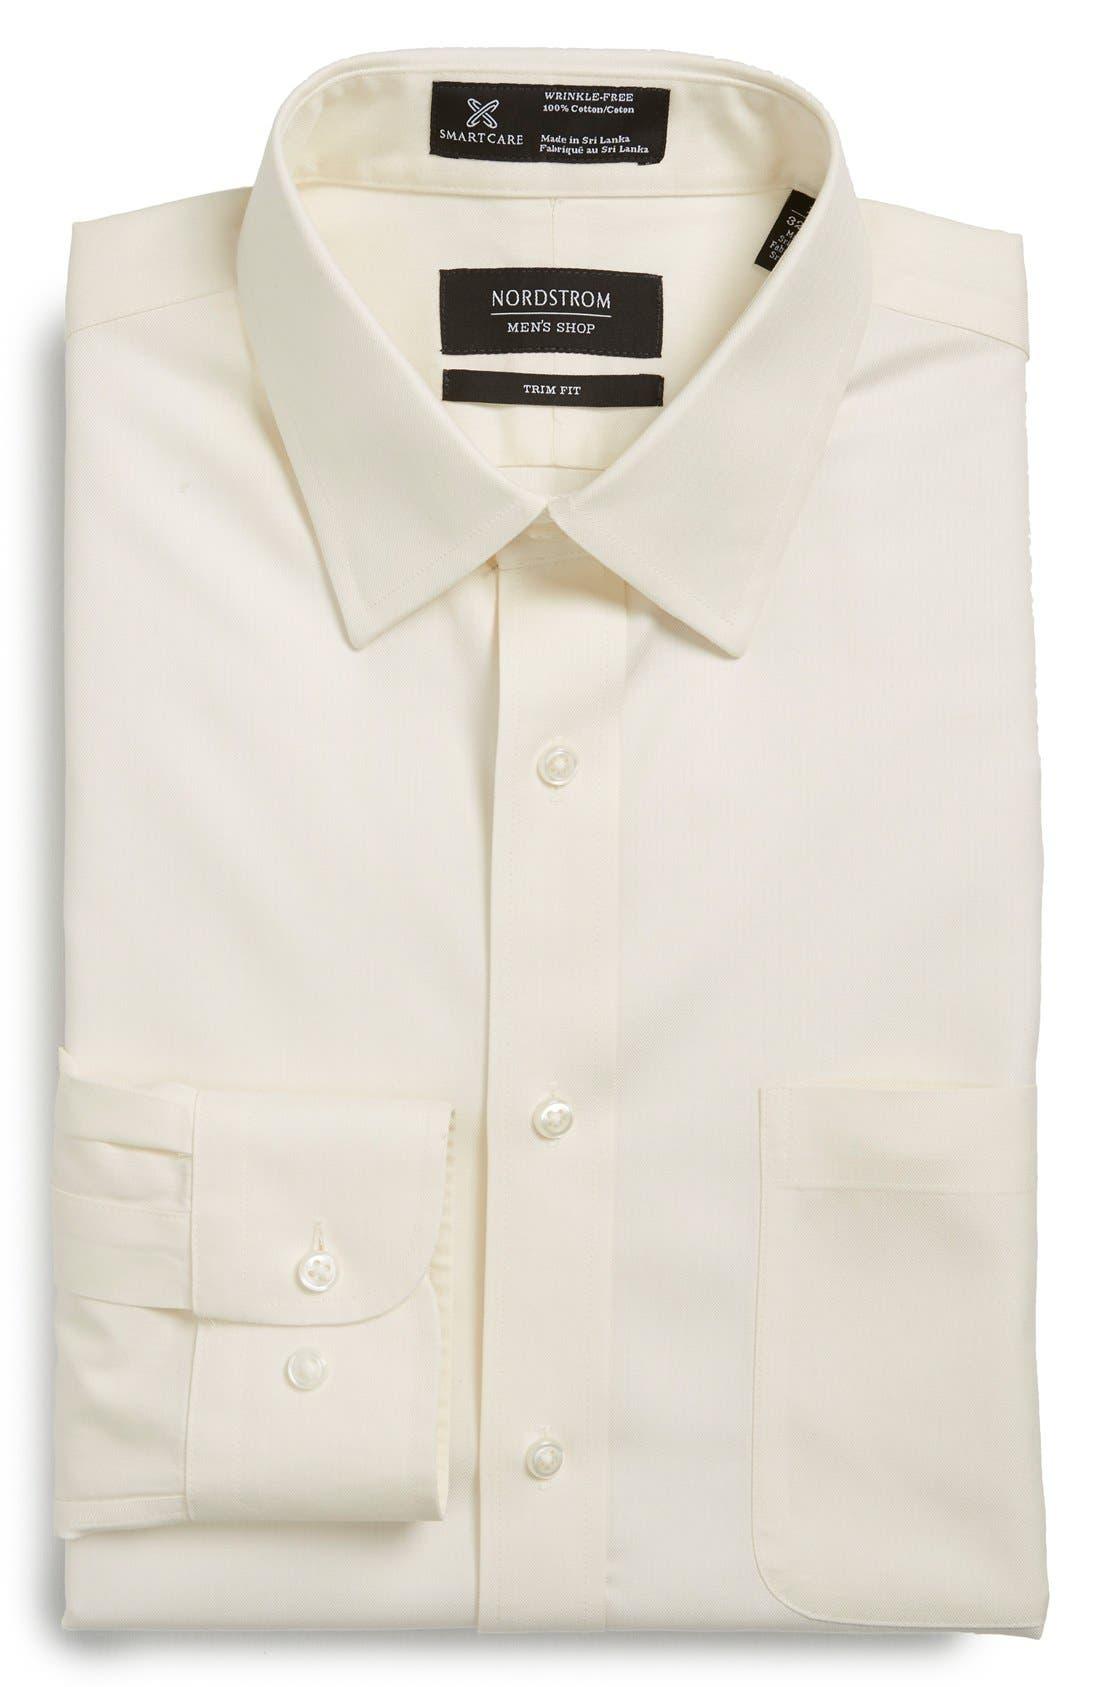 Alternate Image 1 Selected - Nordstrom Men's Shop Smartcare™ Wrinkle Free Herringbone Trim Fit Dress Shirt